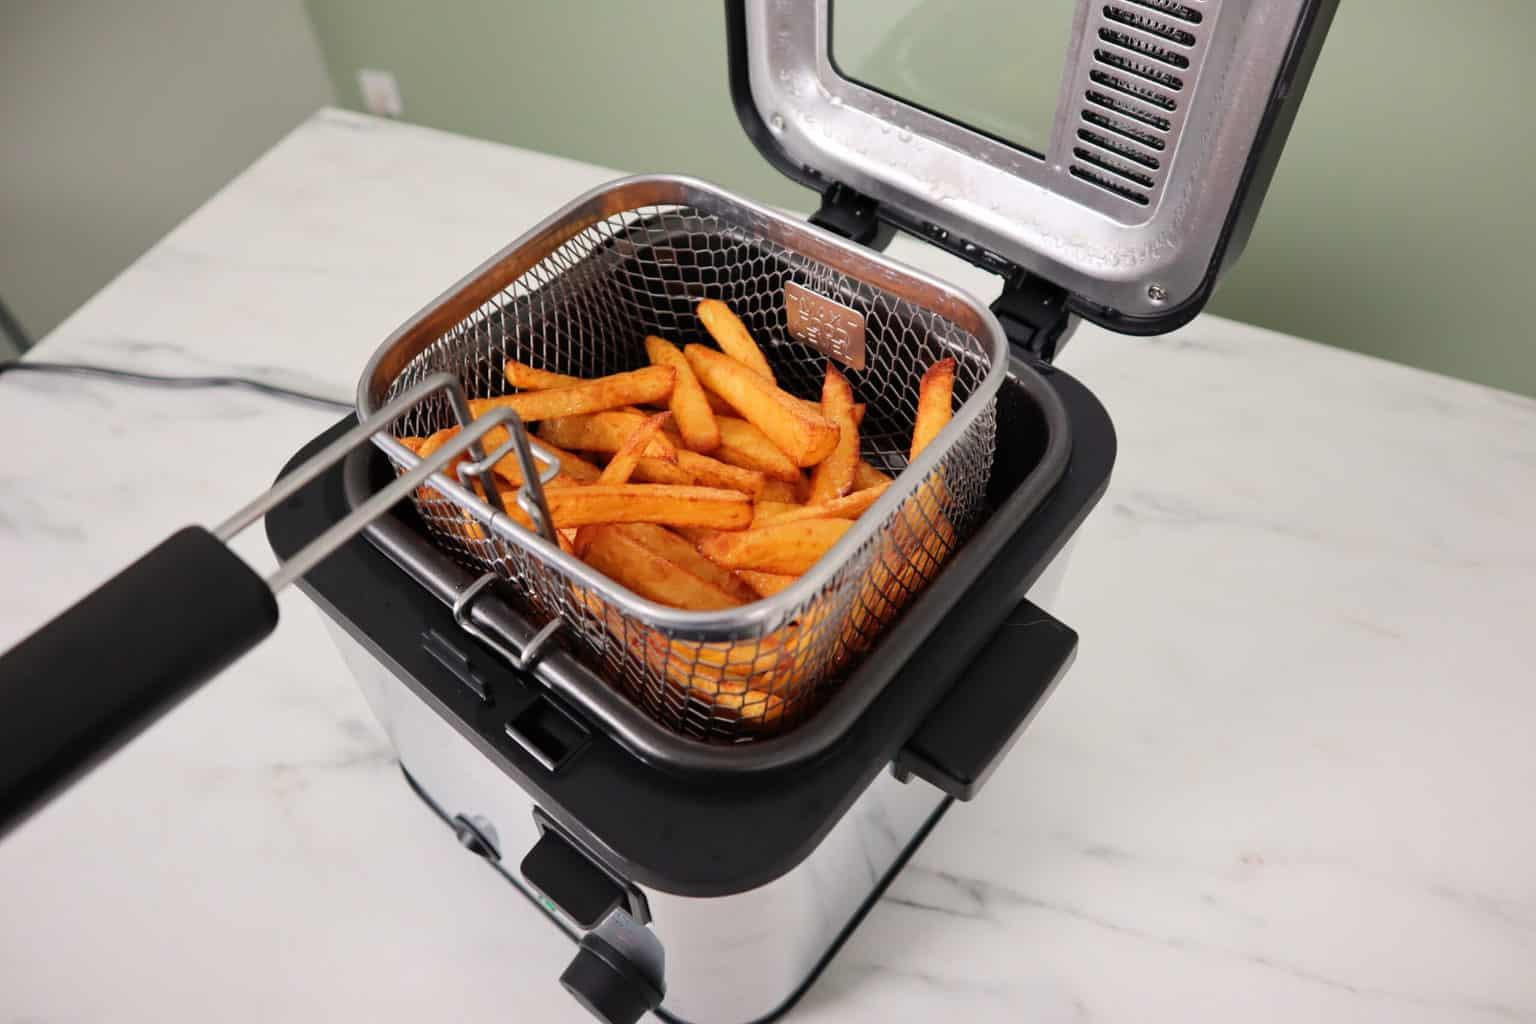 Mini friteuse silvercrest et appareil à fondue